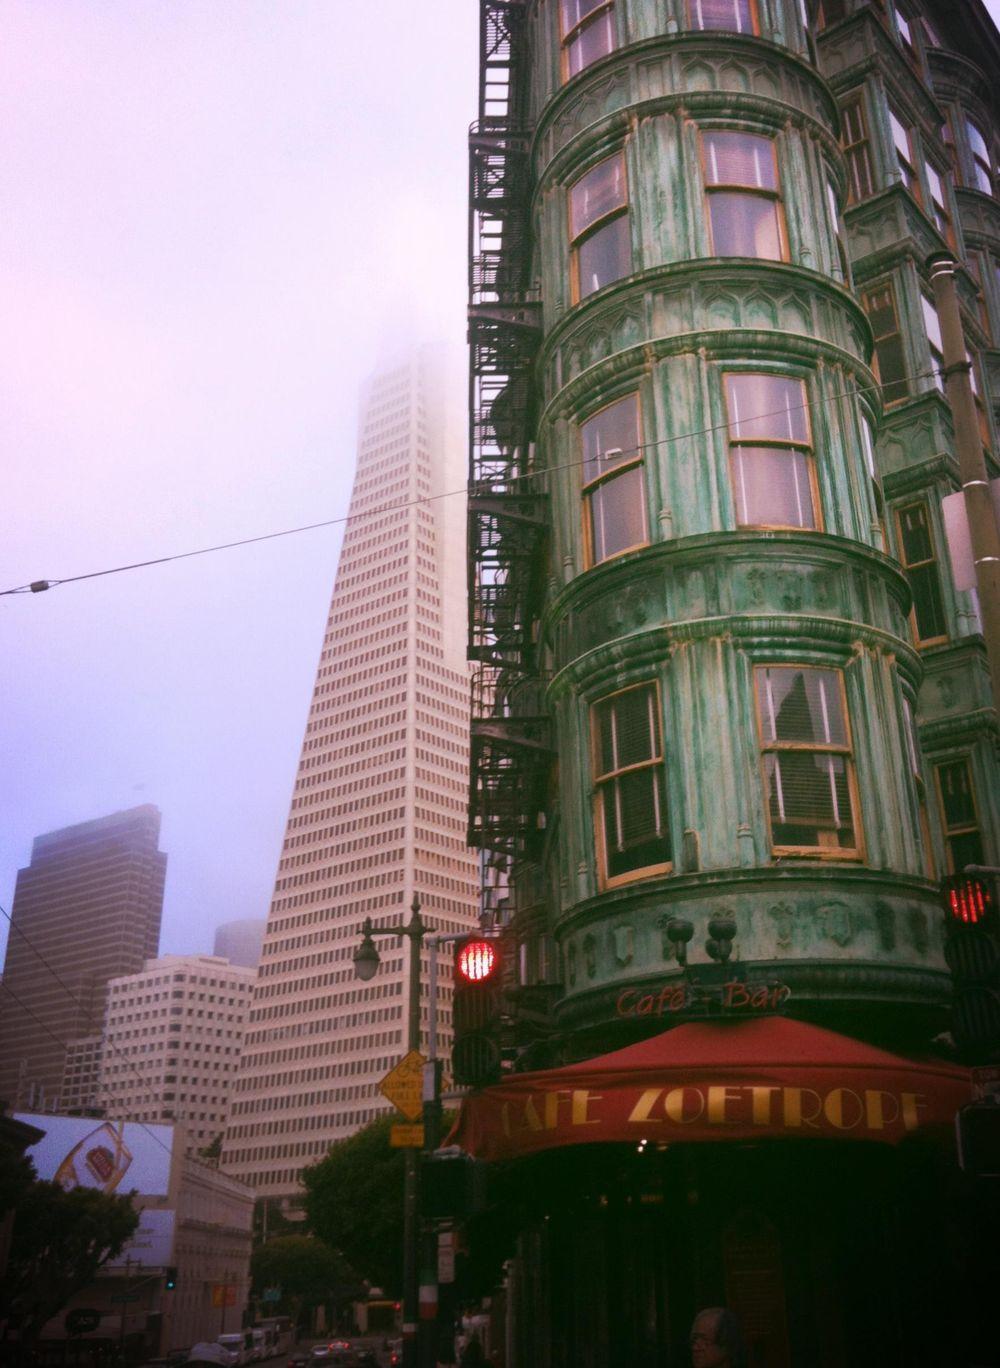 Exploring San Francisco  - image 9 - student project